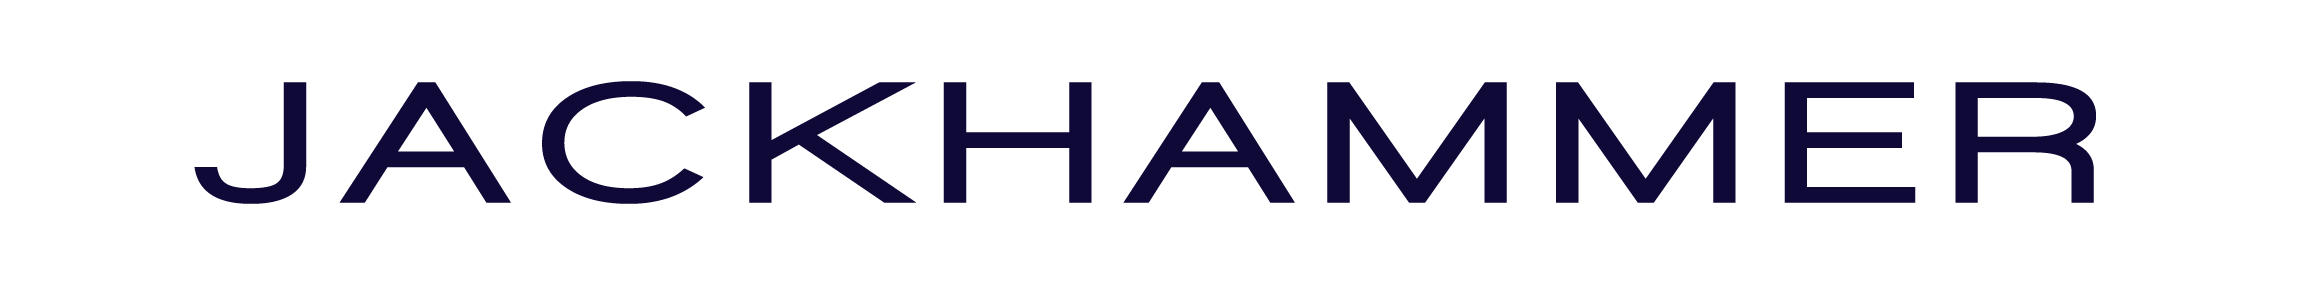 Jackhammer Logo - www.jackhammerwear.com